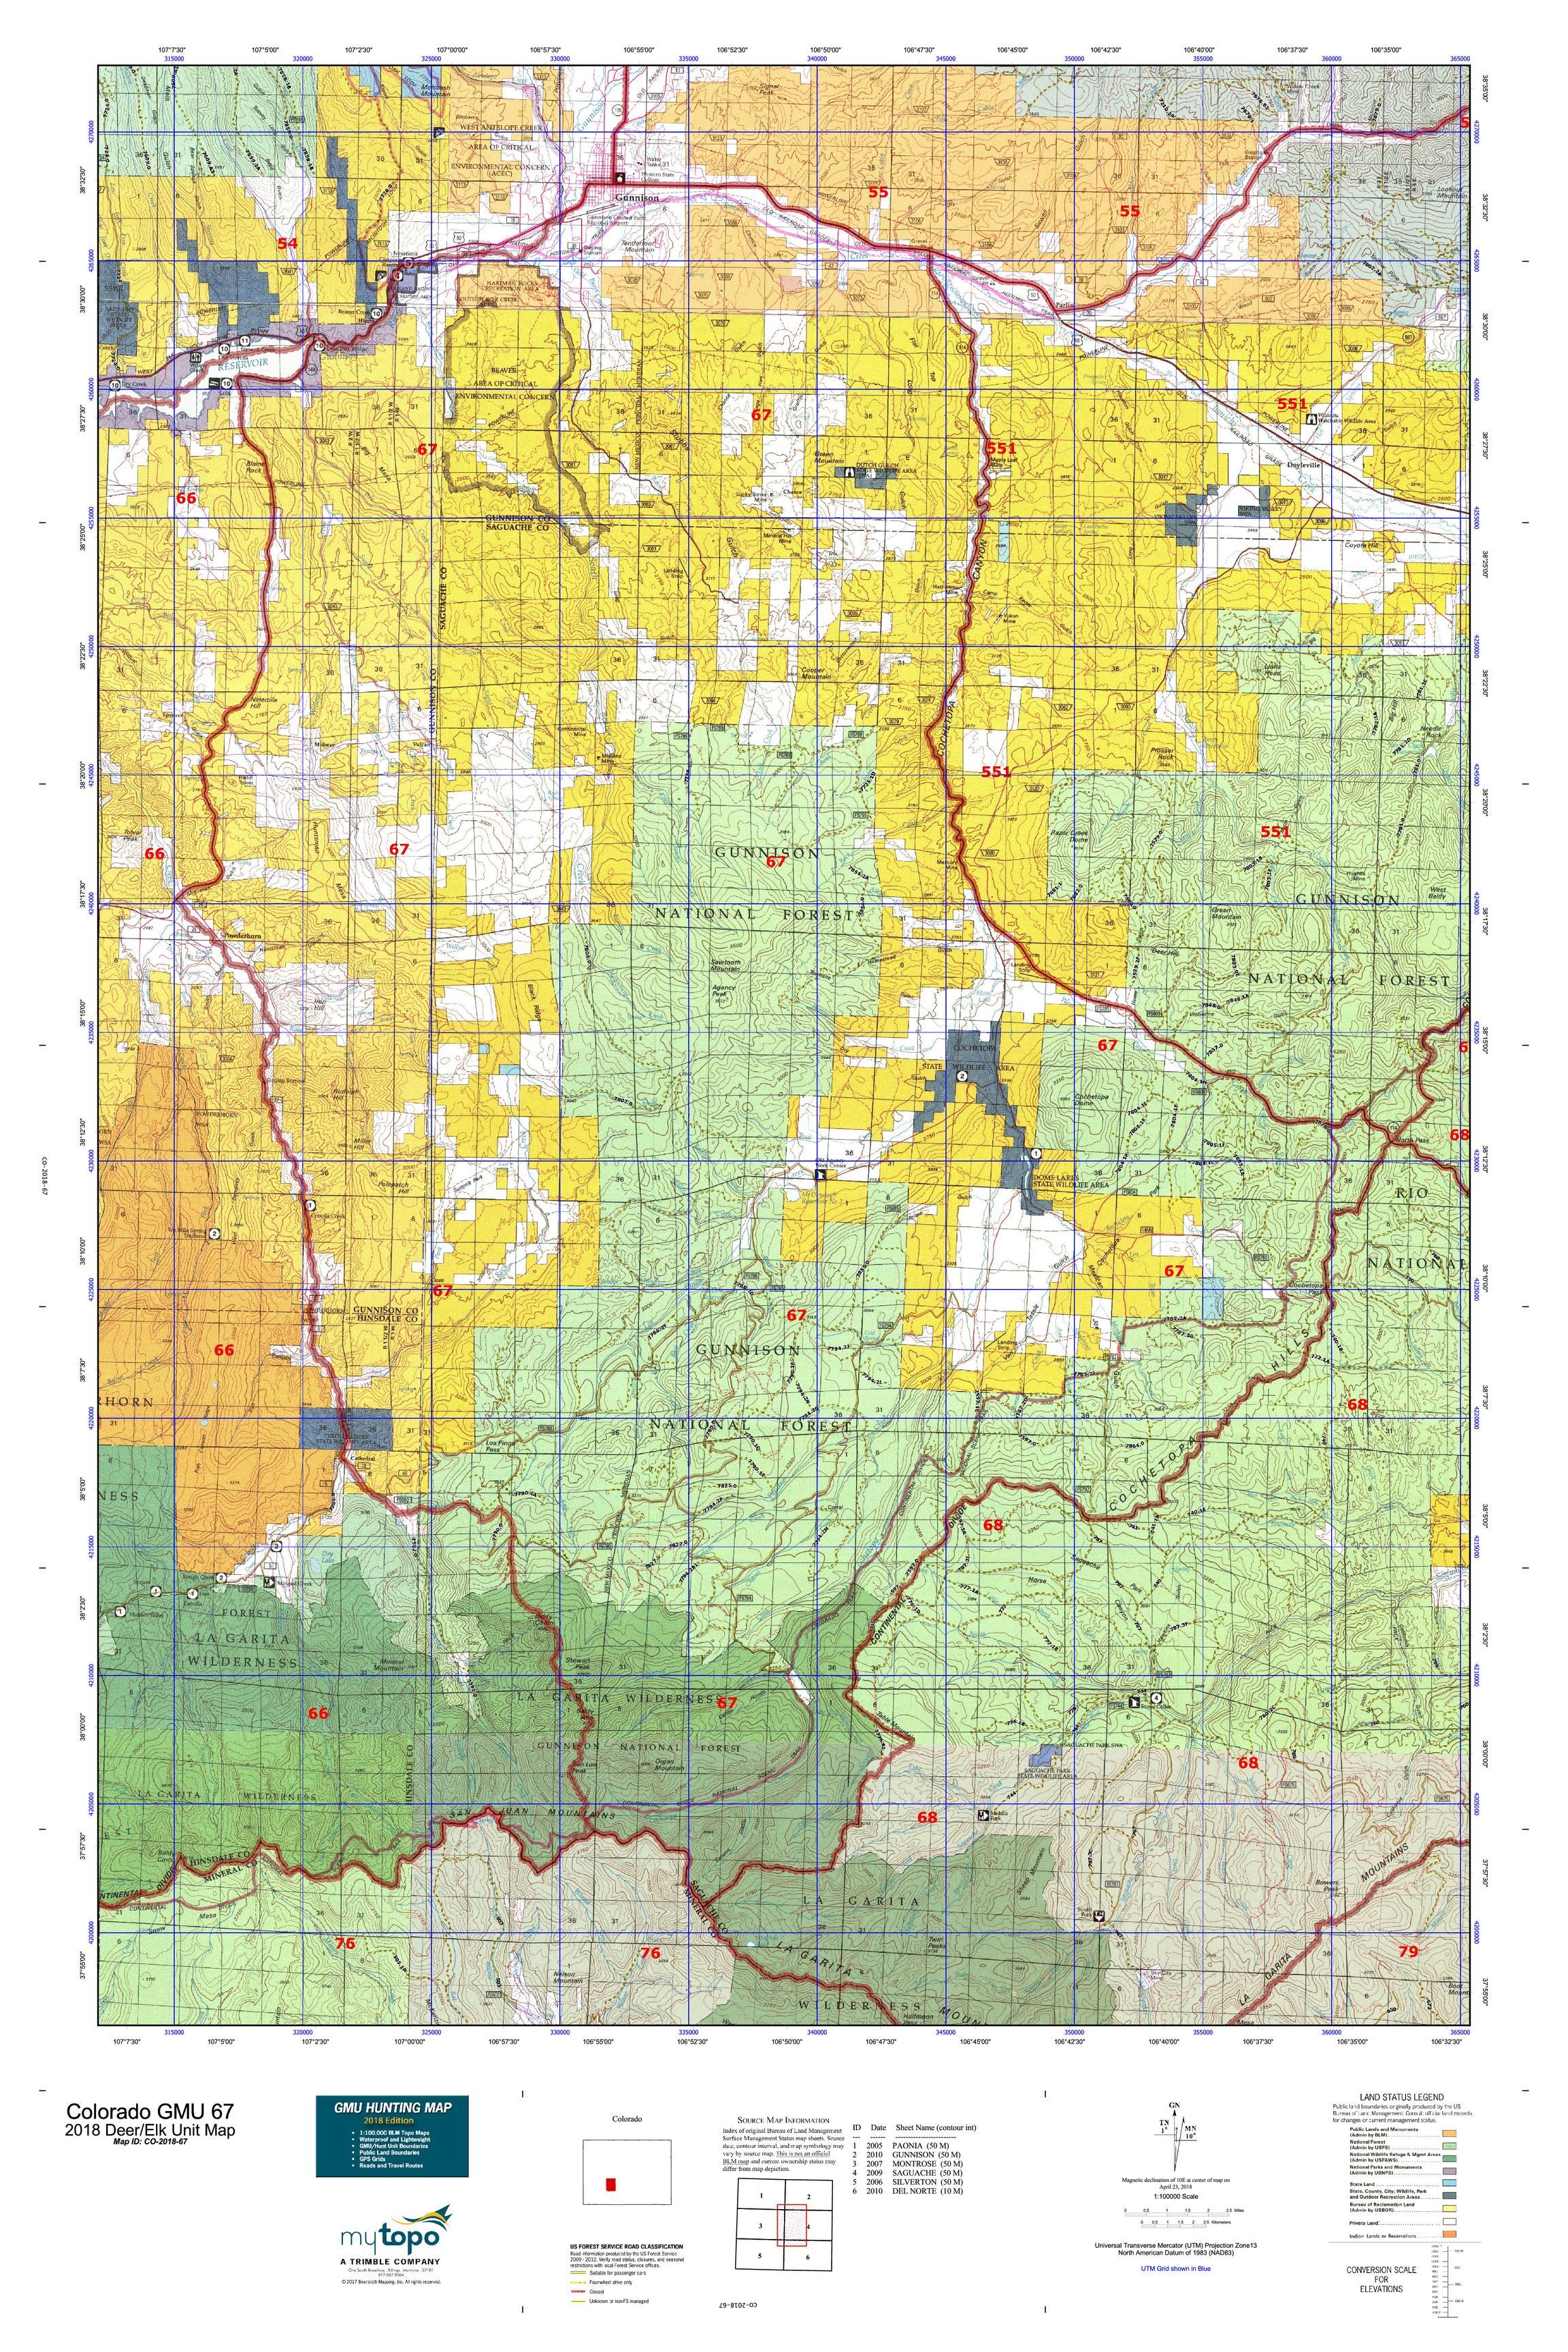 Colorado GMU 67 Map | MyTopo